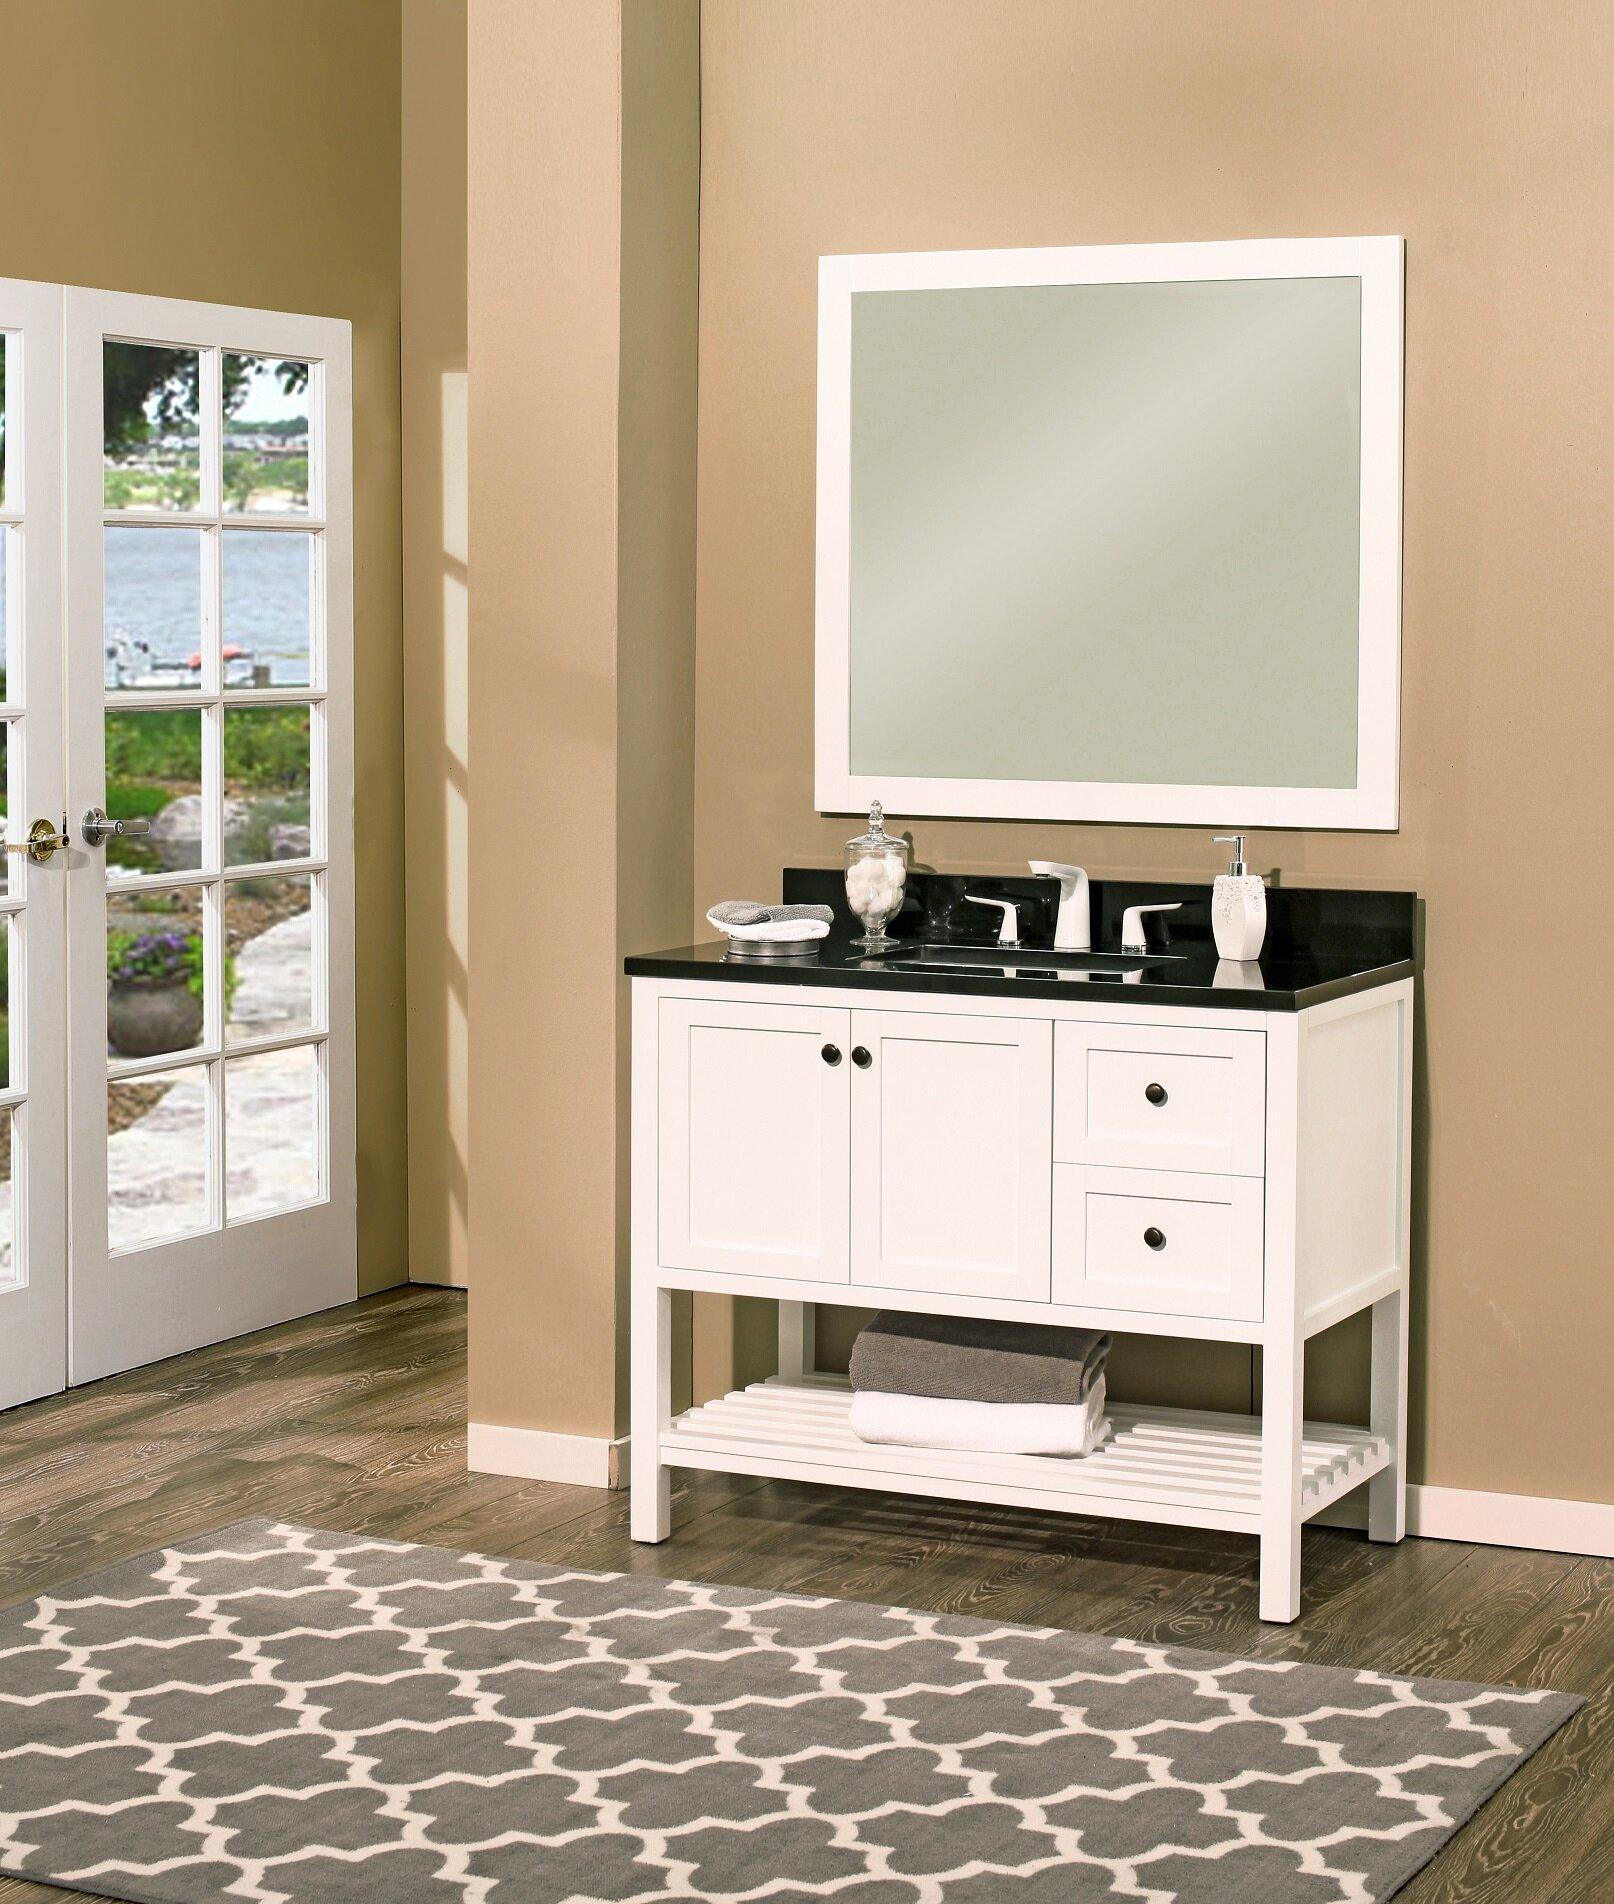 Ngy Stone Cabinet Hampton Bay 42 Single Bathroom Vanity With Mirror Wayfair